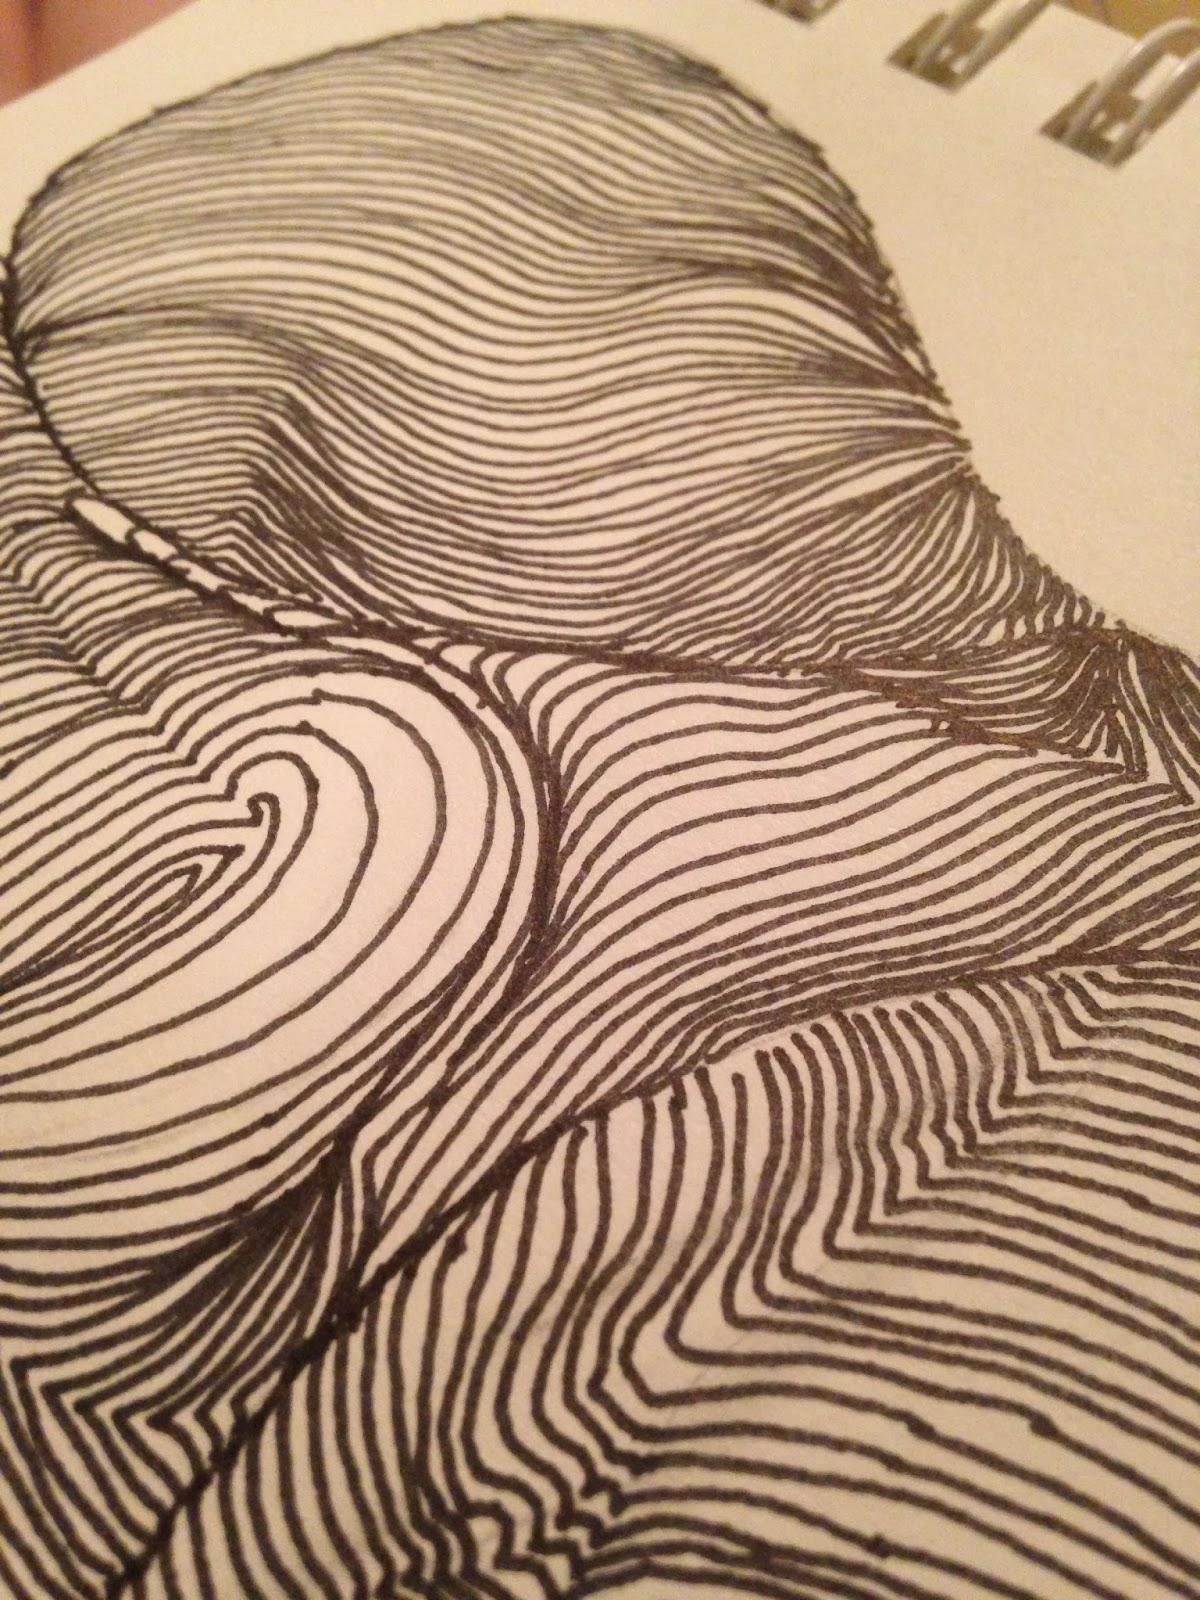 Galleries related zentangle patterns zentangle horse